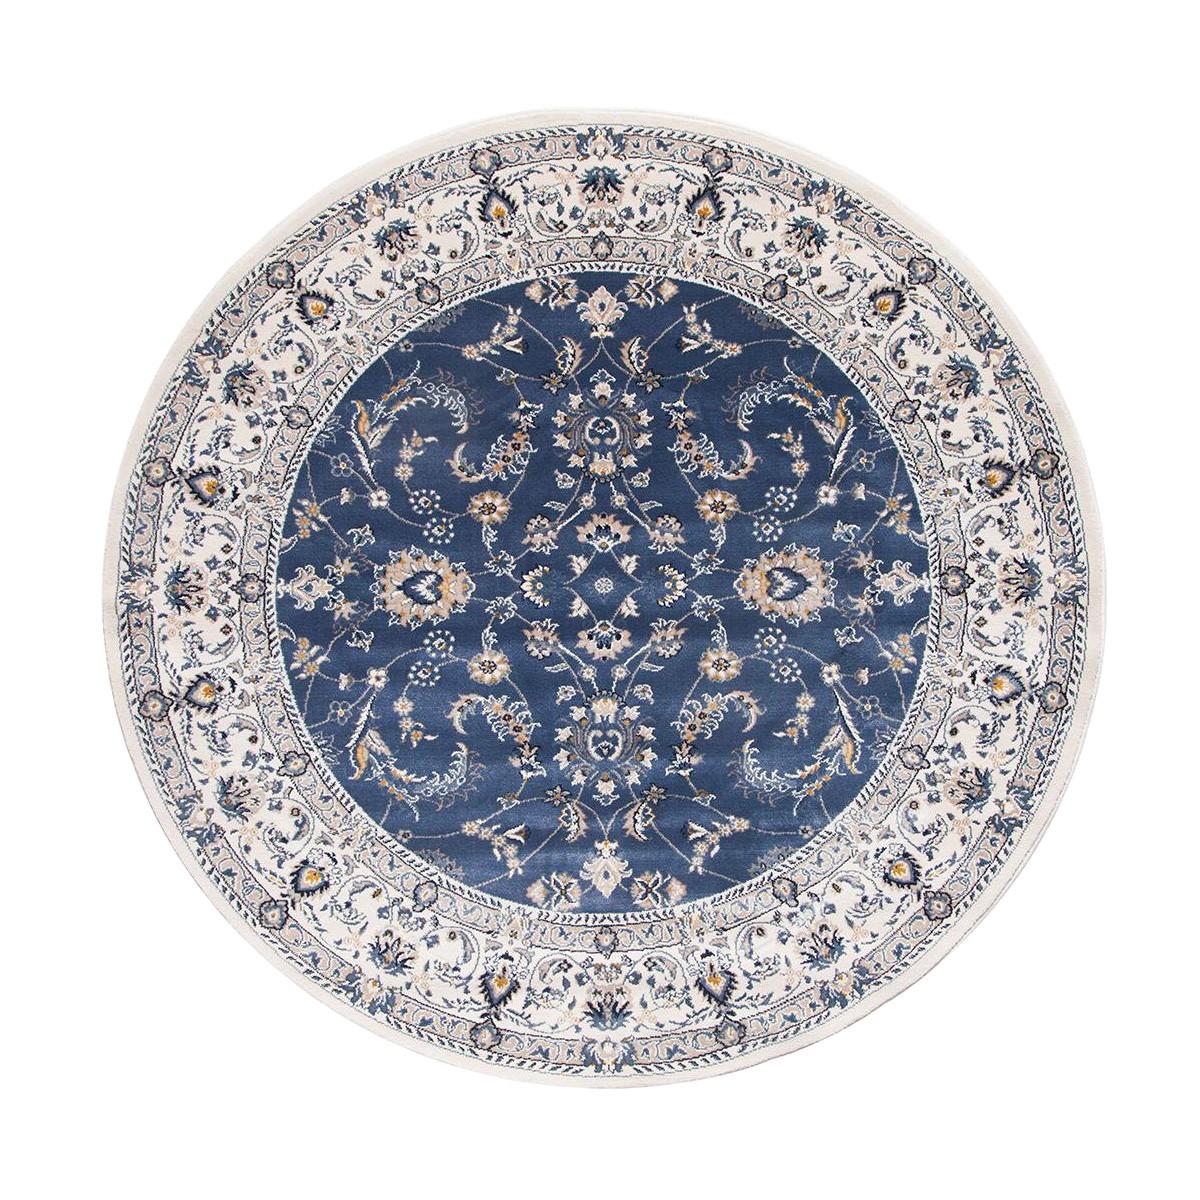 Palace Aisha Oriental Round Rug, 200cm, Blue/White